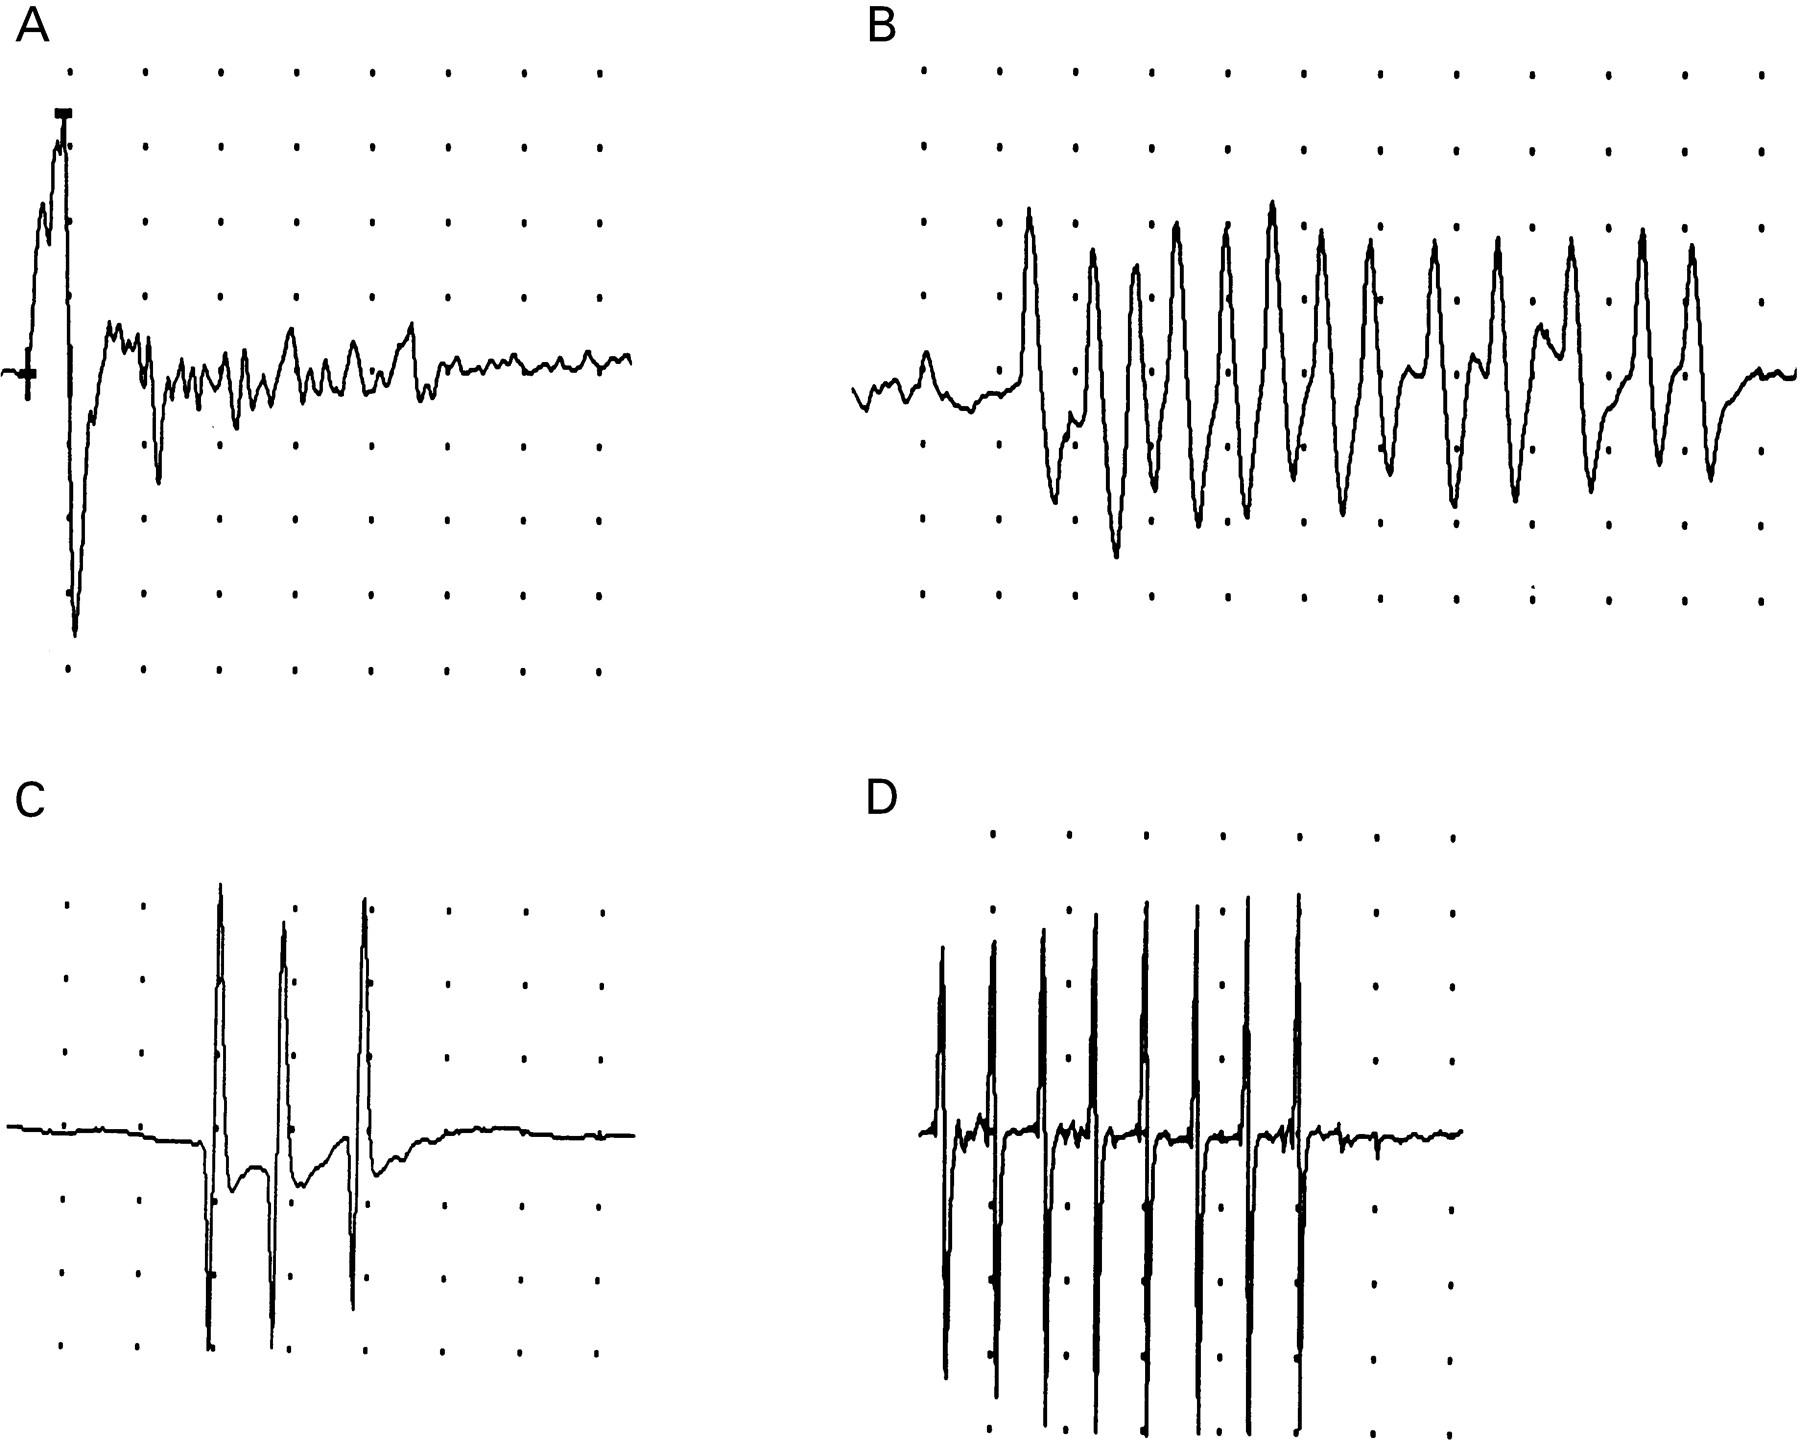 Morvan's fibrillary chorea: a paraneoplastic manifestation